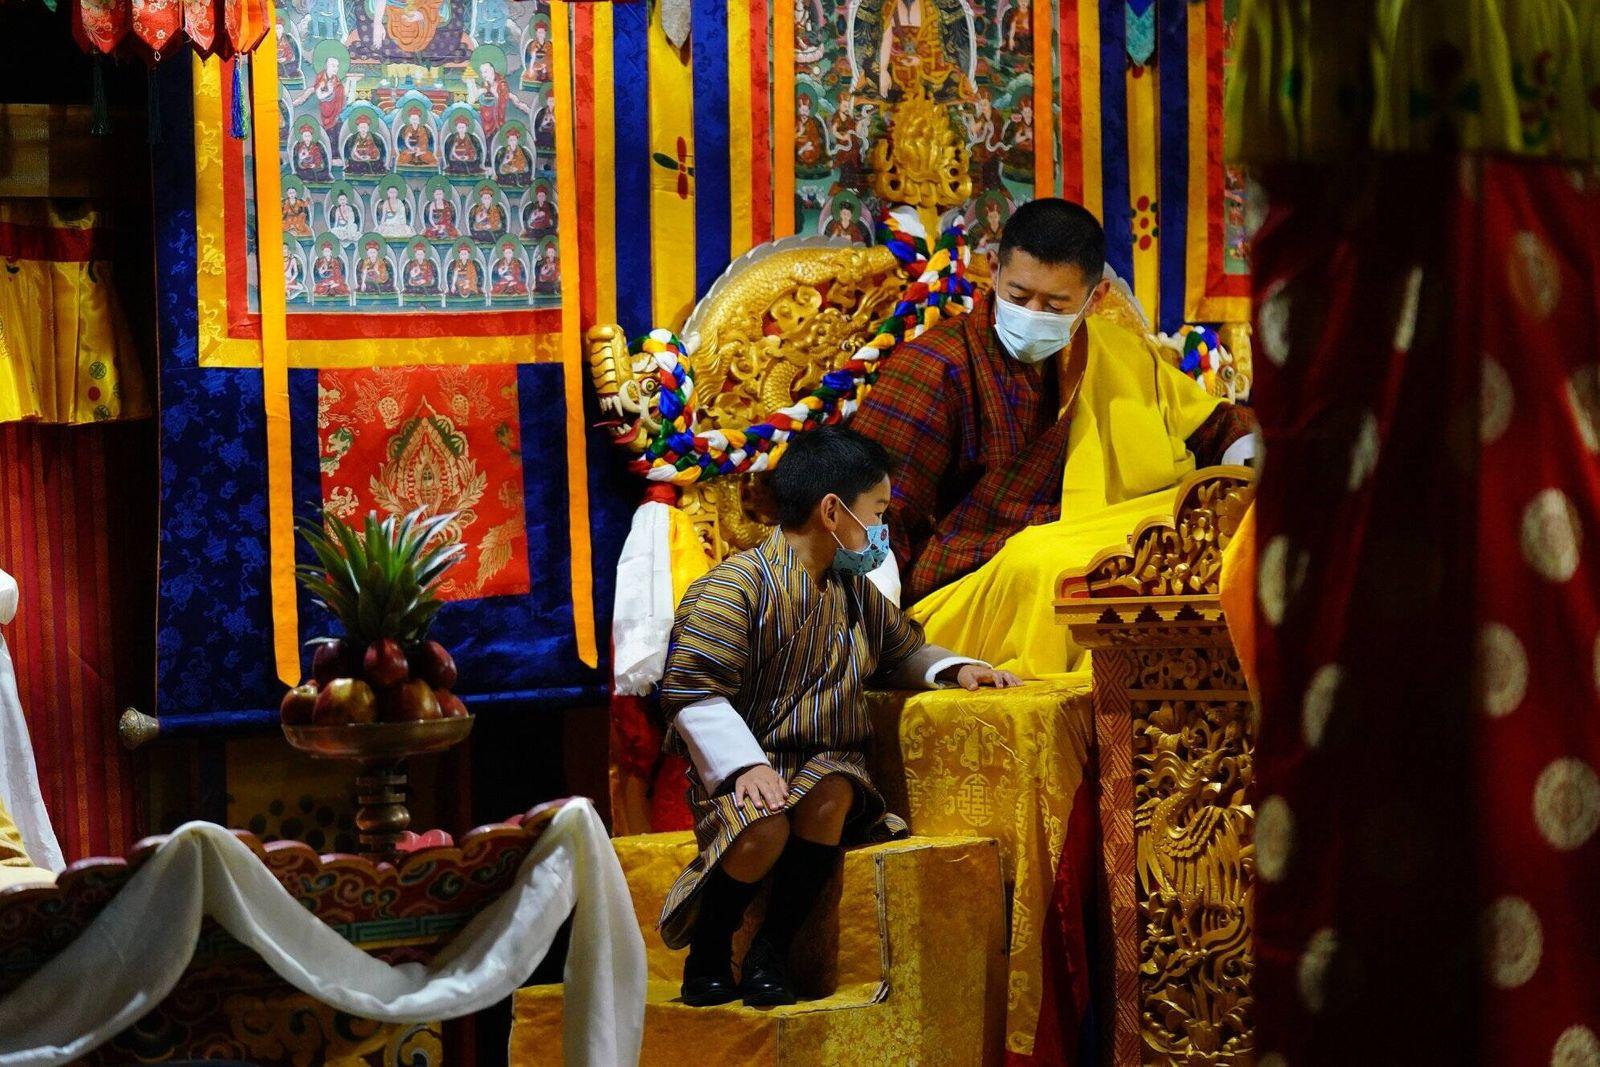 14-04-2021 Bhutan Majesty King Jigme Khesar Namgyel Wangchuck and Queen Jetsun Pema visited Mongar Dzong accompanied by